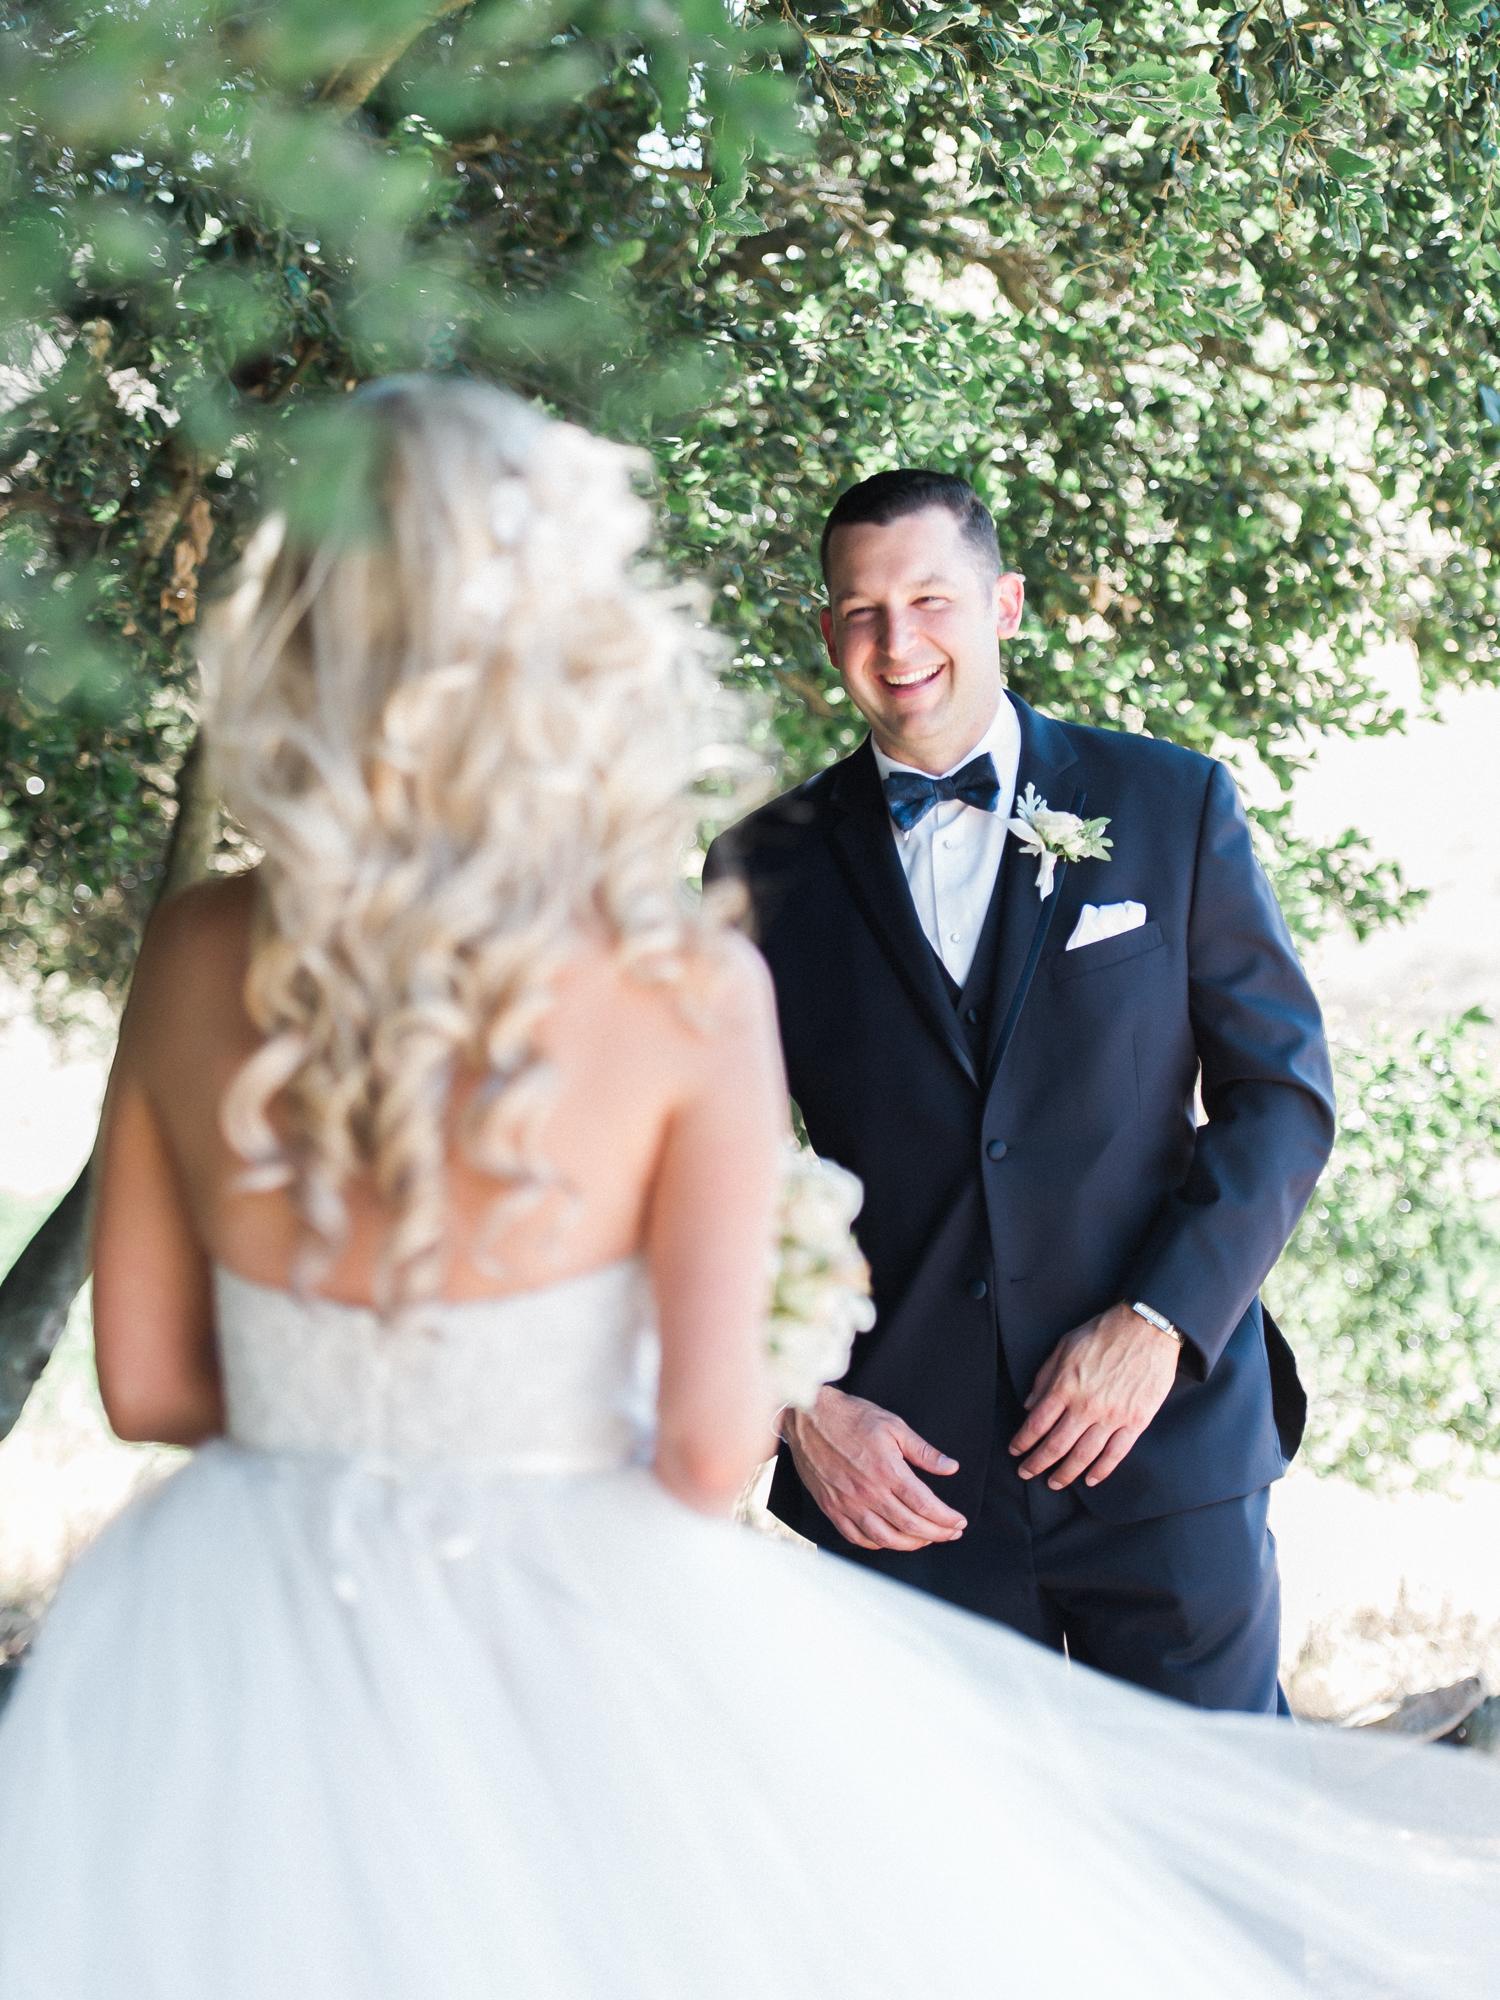 Aimee+Logan_wedding_spp-36.jpg